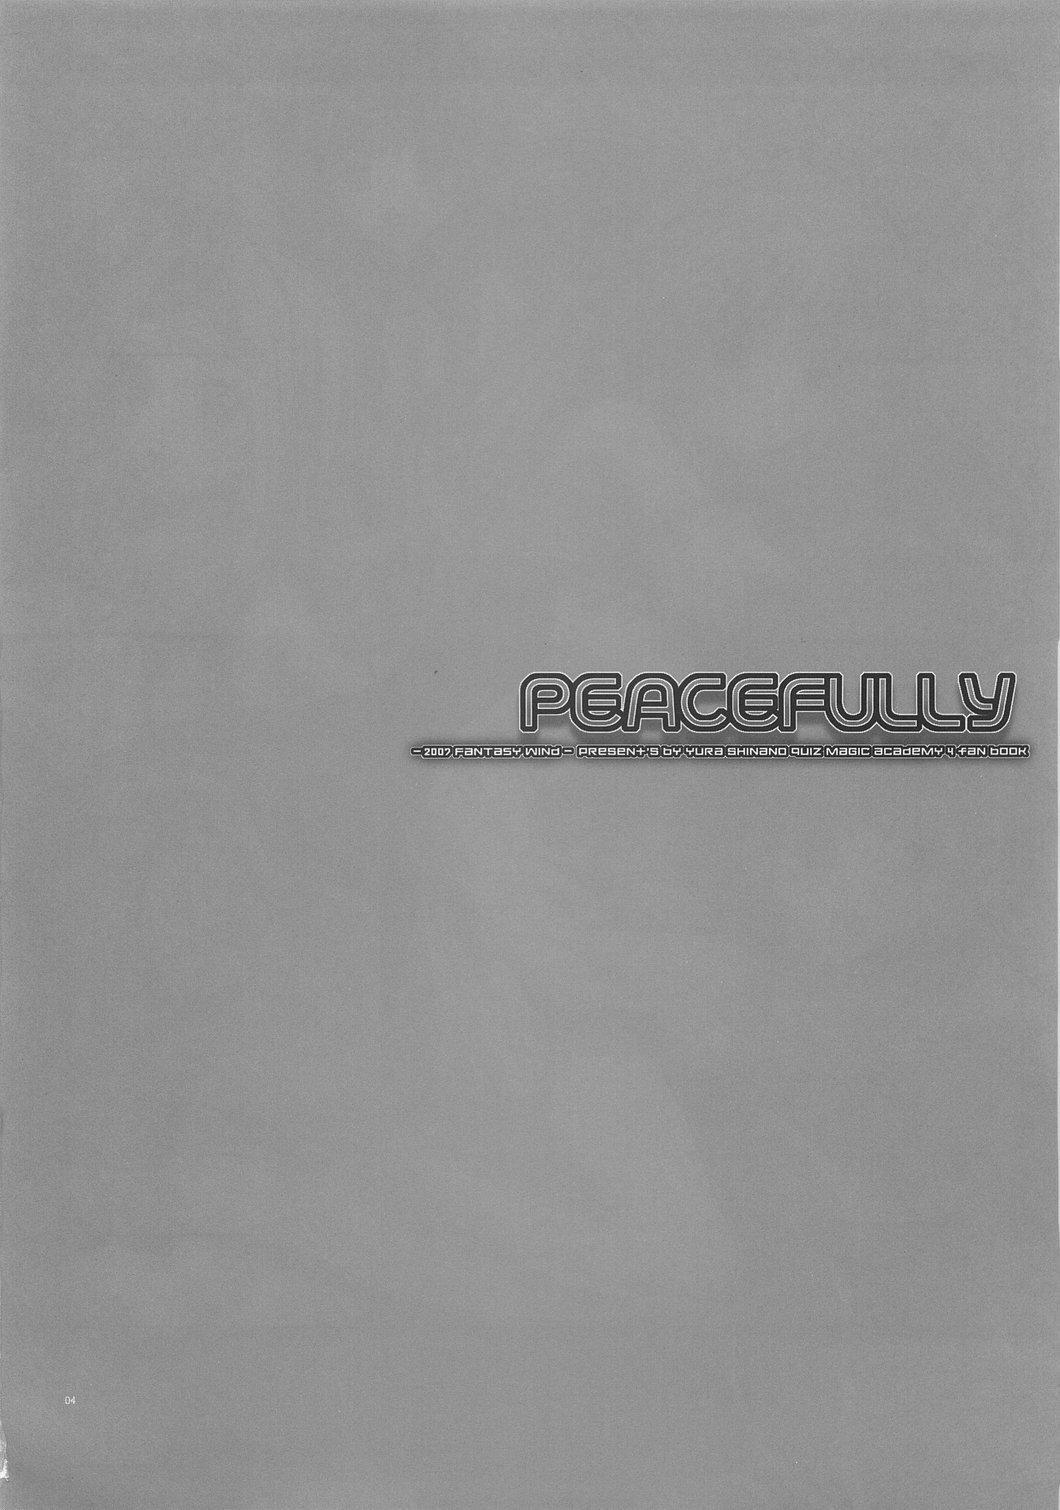 PEACEFULLY 2